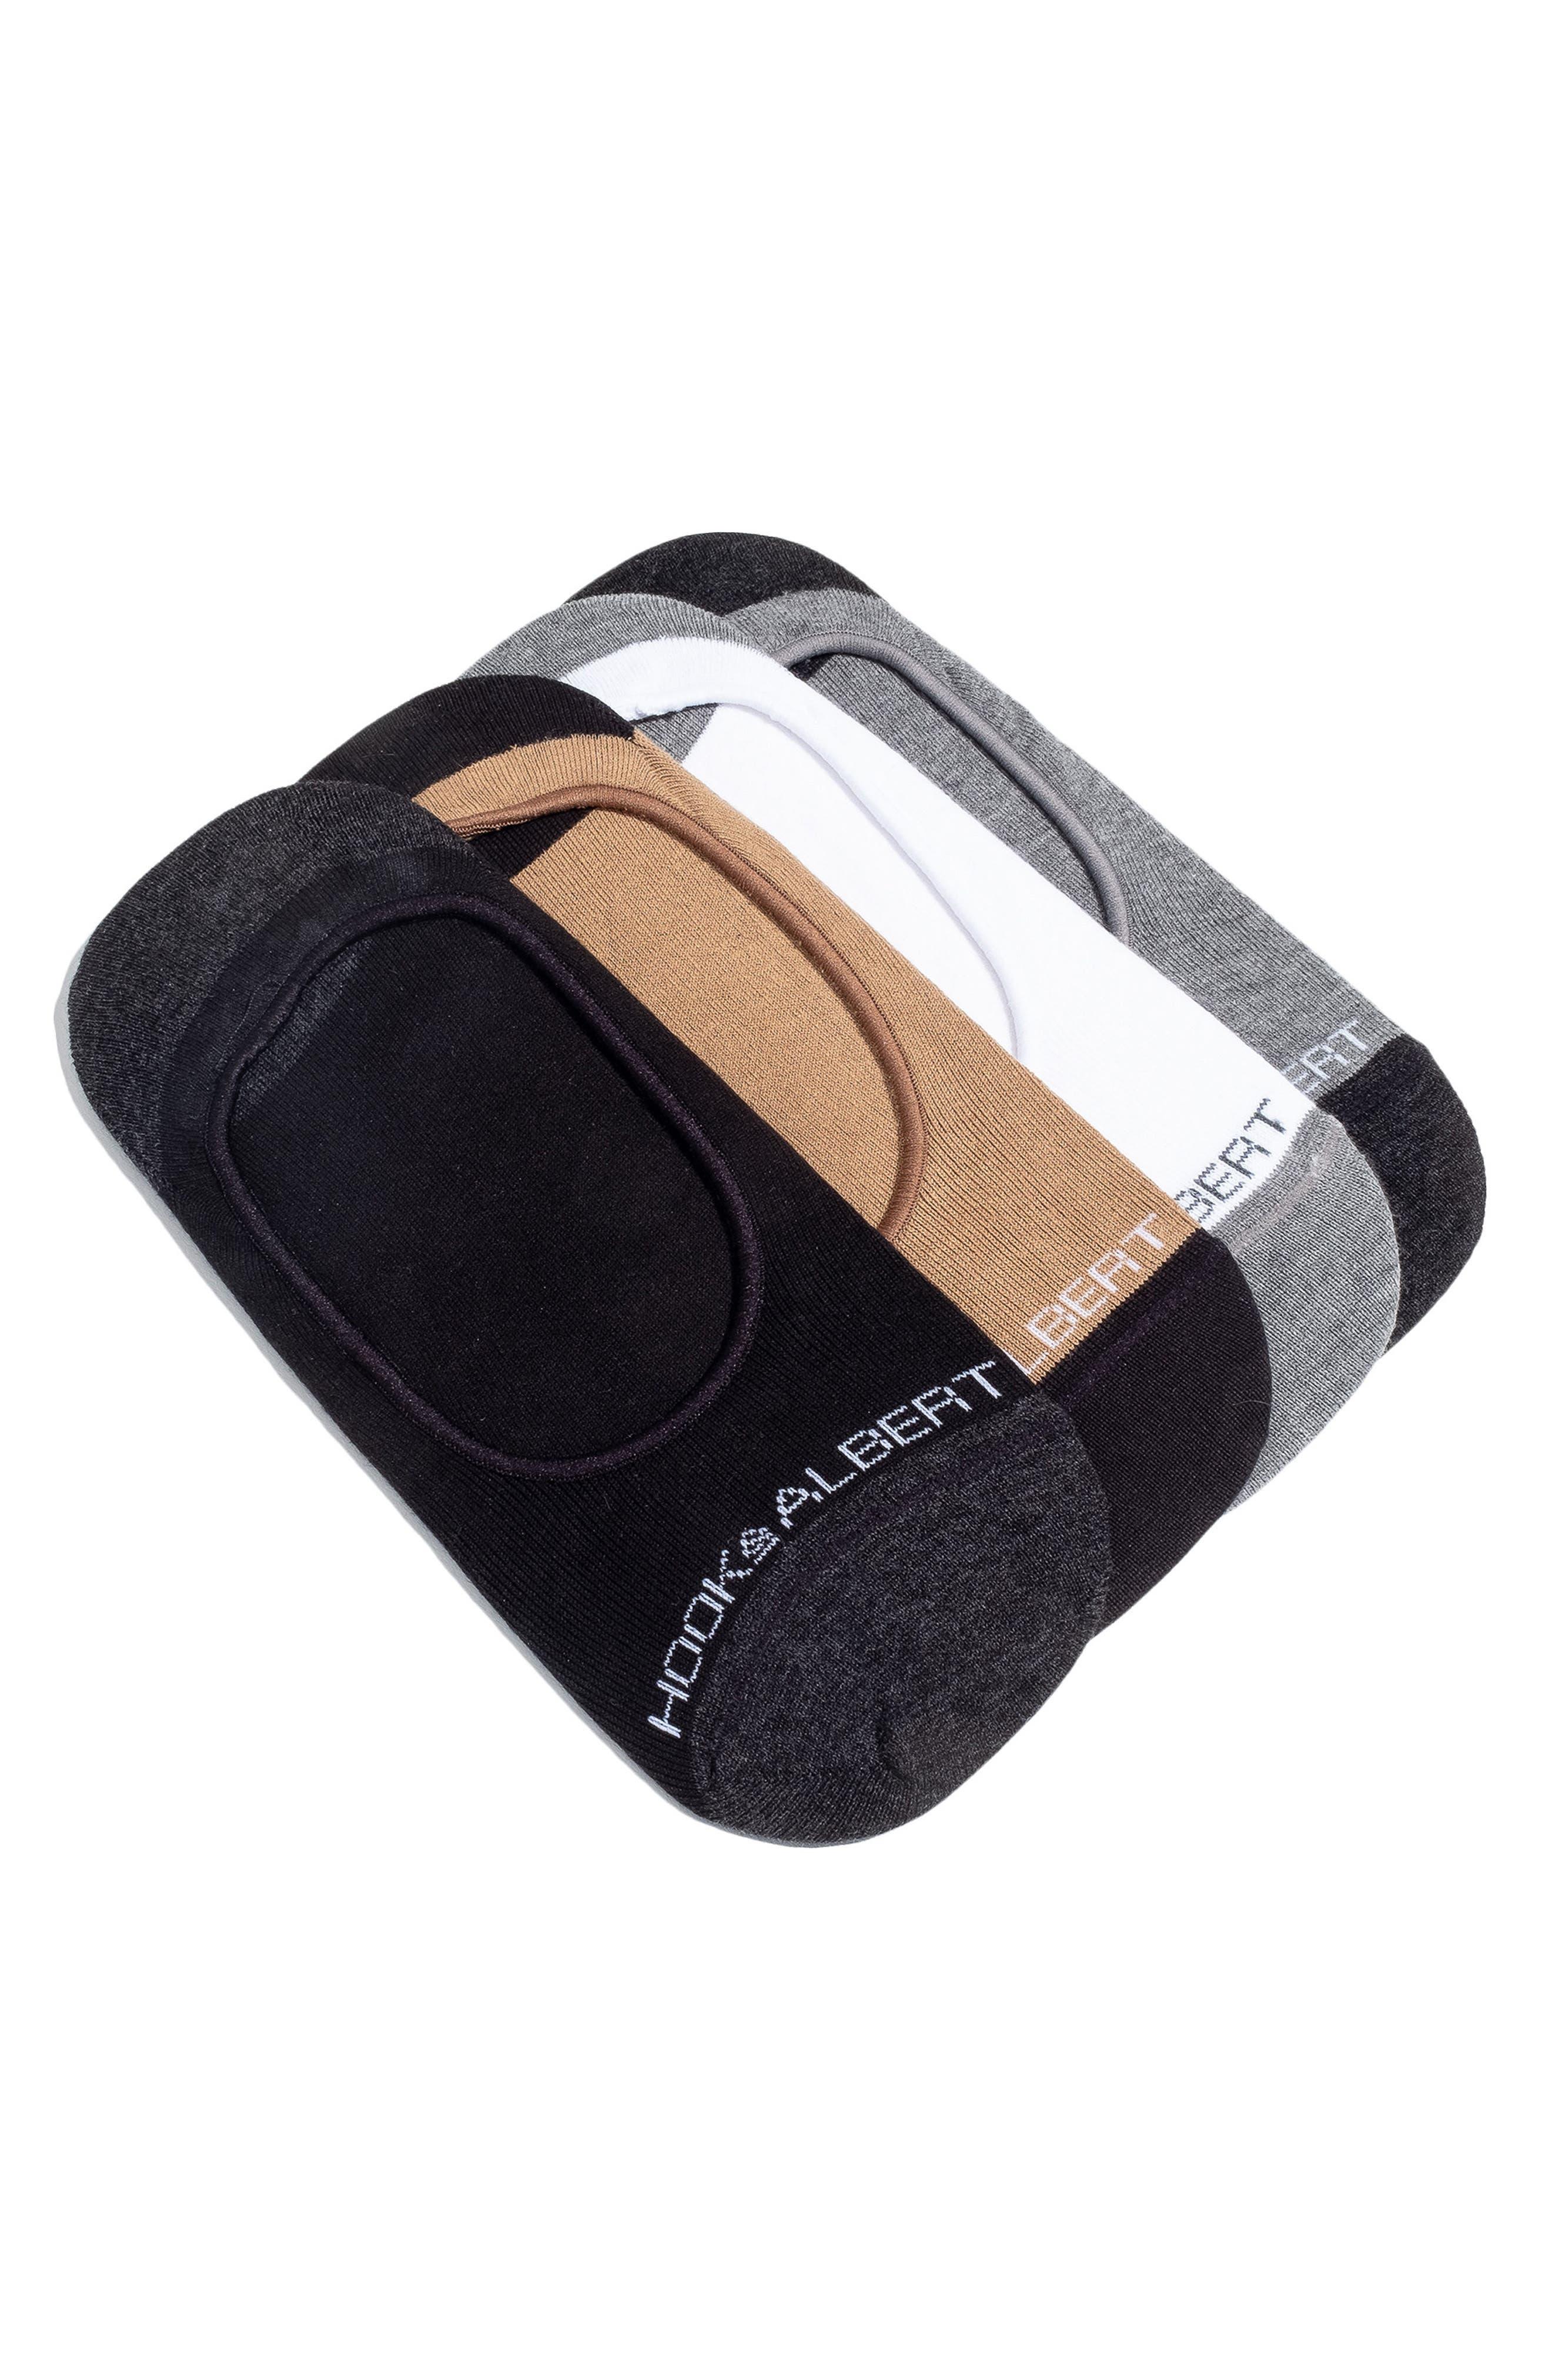 4-Pack Liner Socks,                             Main thumbnail 1, color,                             BLACK